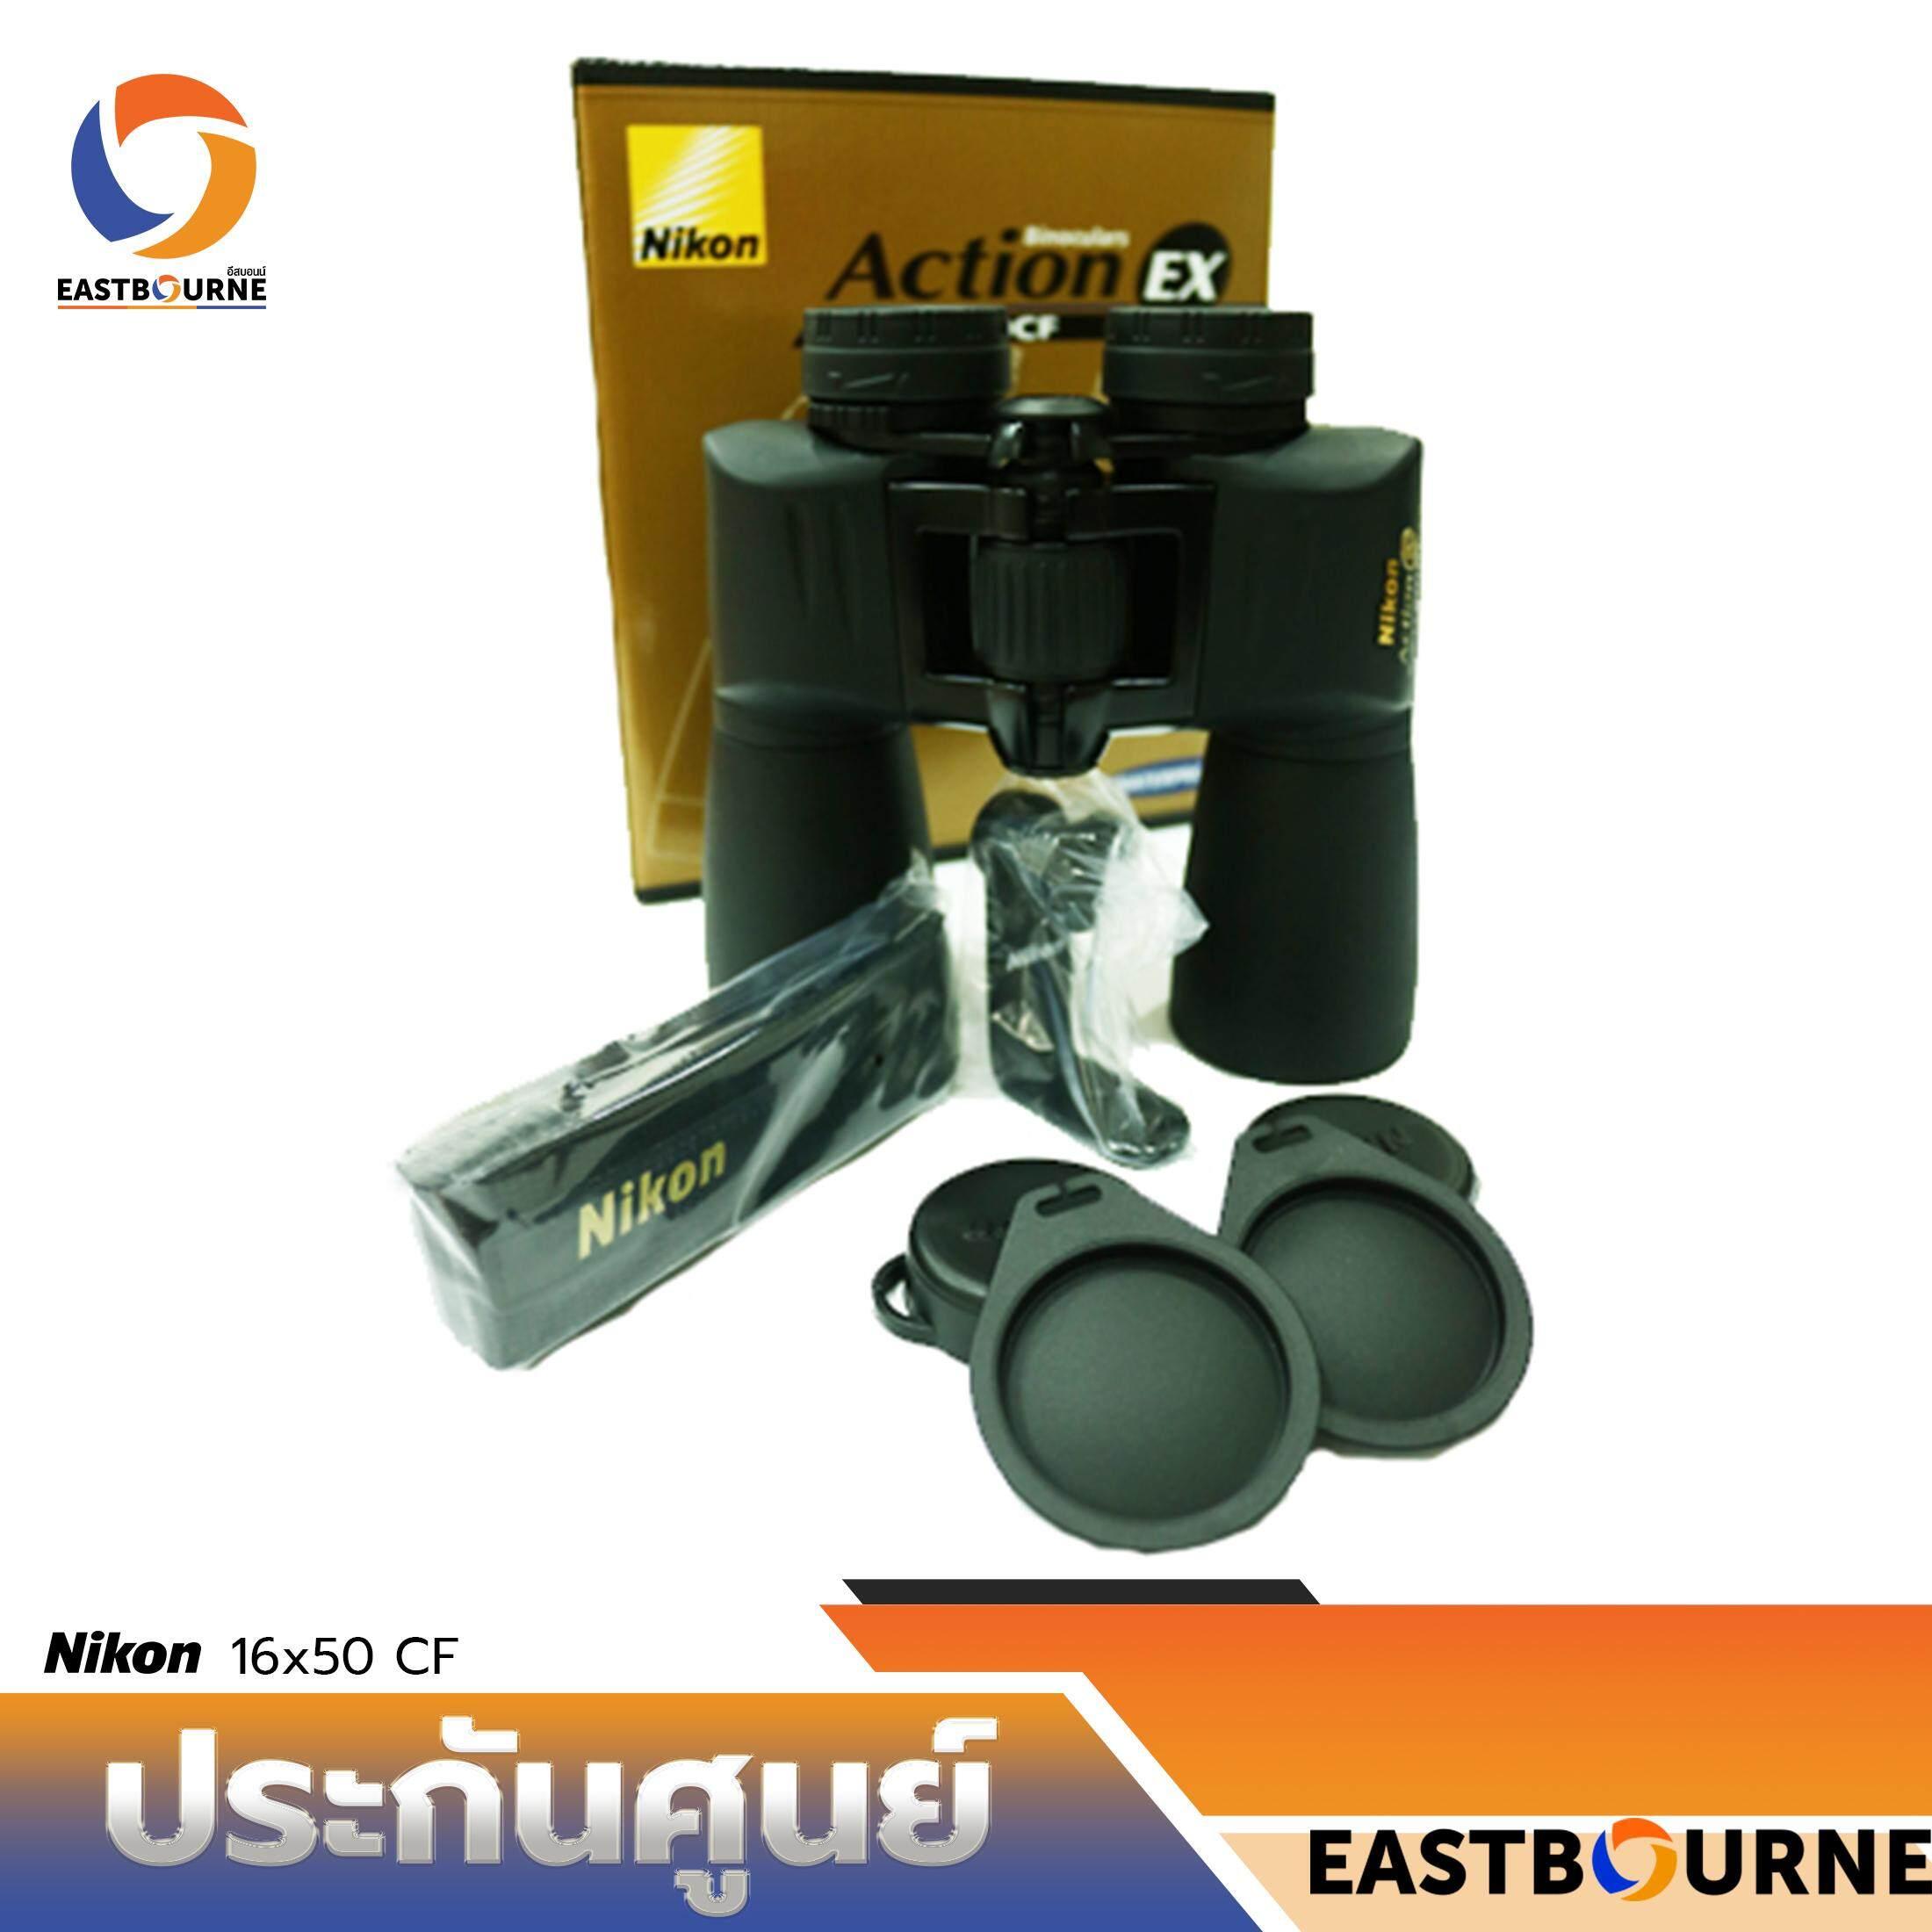 Binoculares 196 x 177 x 0 mm Nikon Action EX 16x50CF